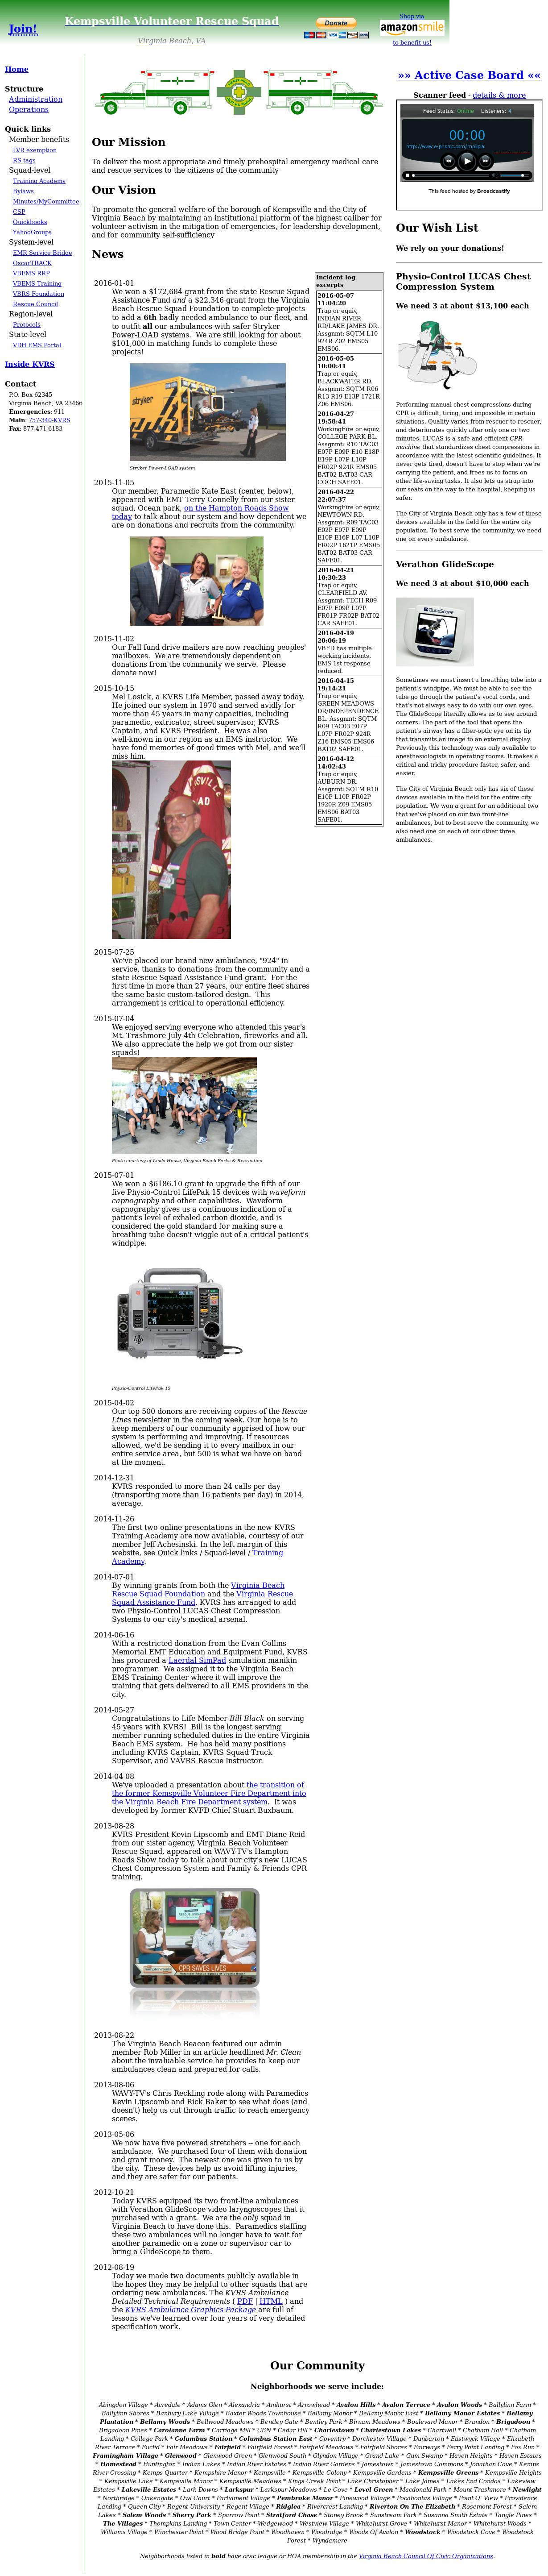 Kempsville Vlntr Rescue Squad Competitors, Revenue and Employees